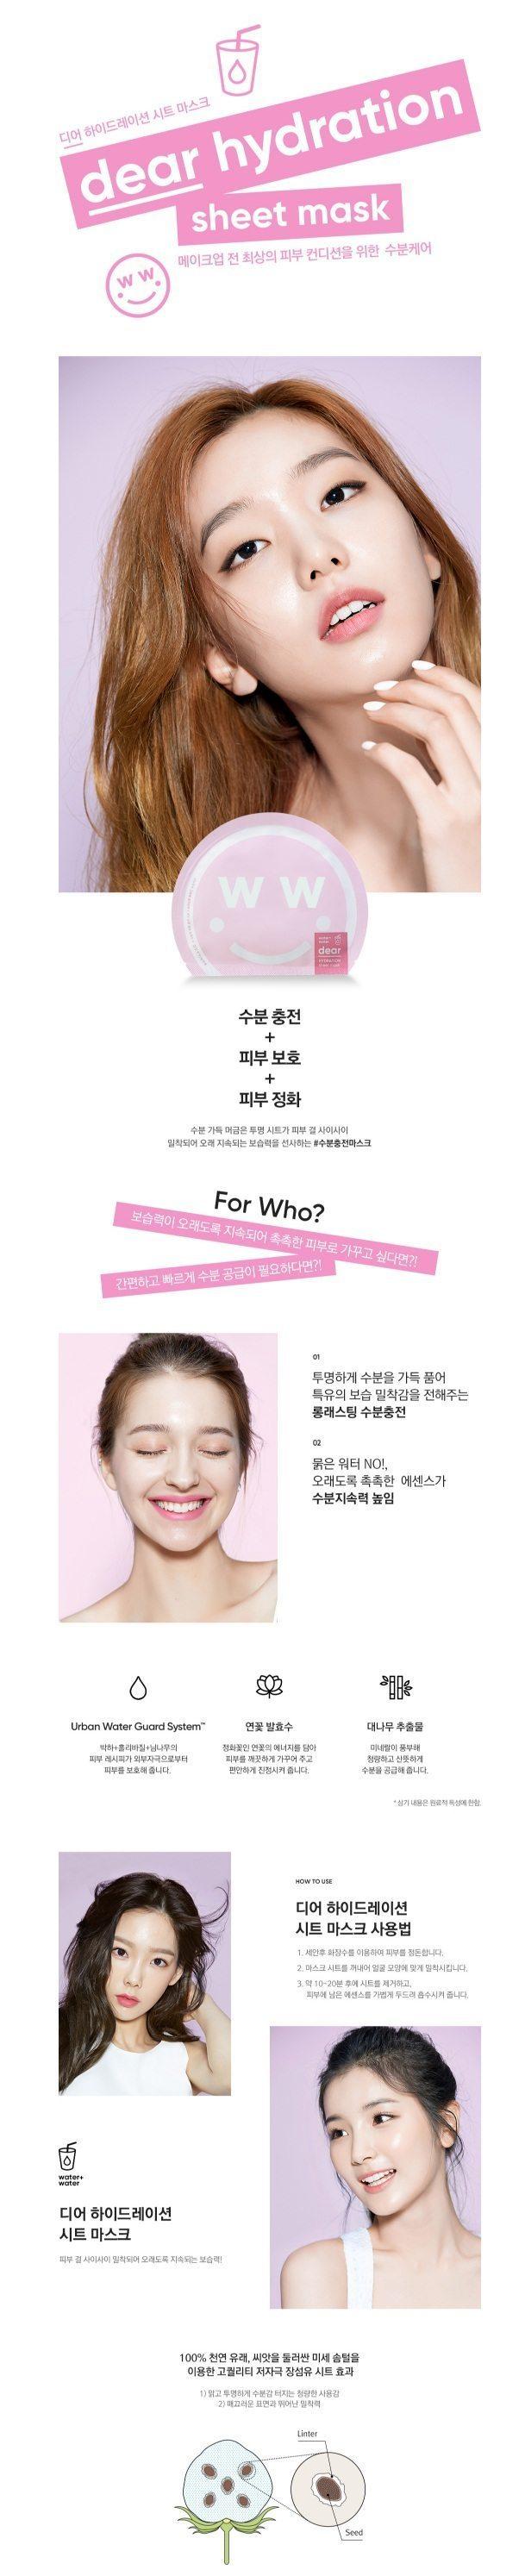 Banila Co Dear Hydration Sheet Mask korean cosmetic skincare product online shop malaysia macau singapore1